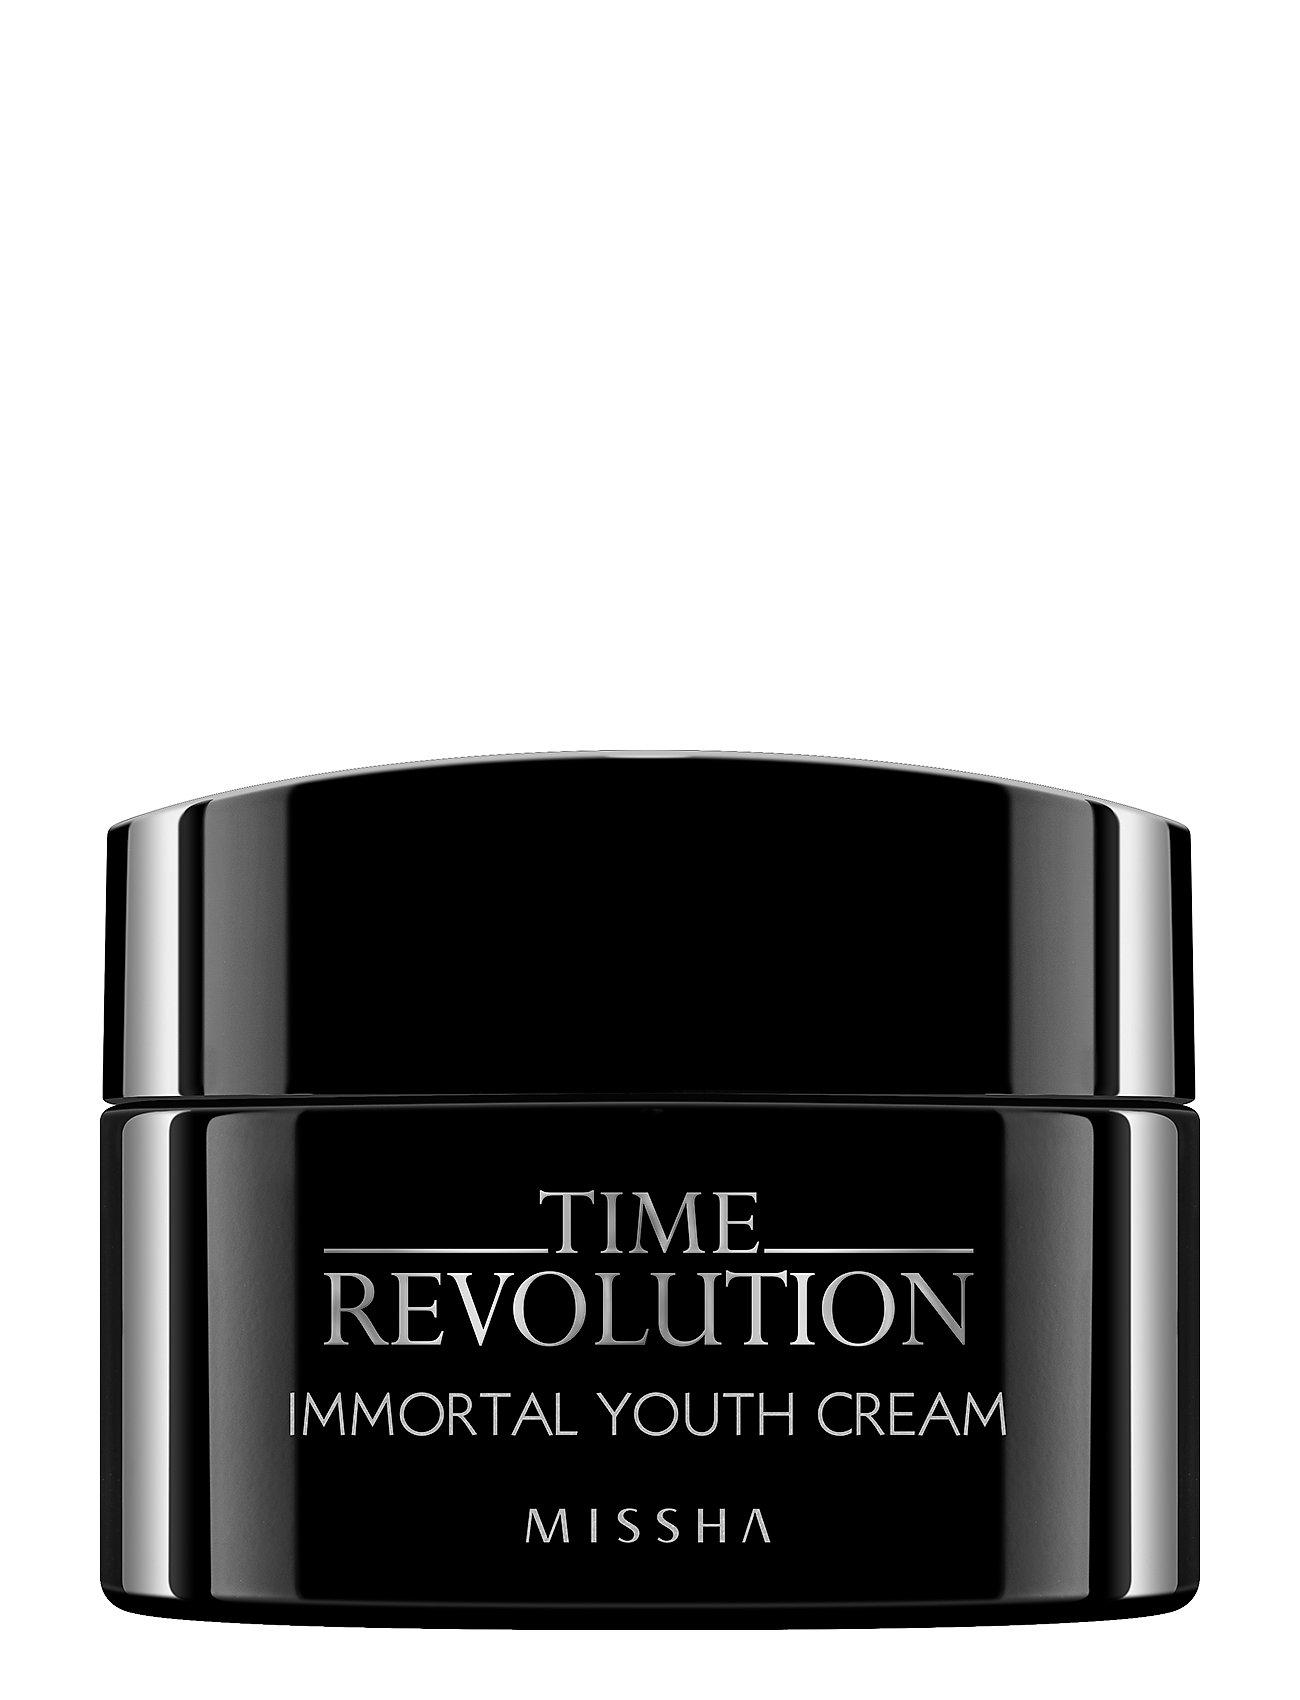 Missha Time Revolution Immortal Youth Cream - Missha